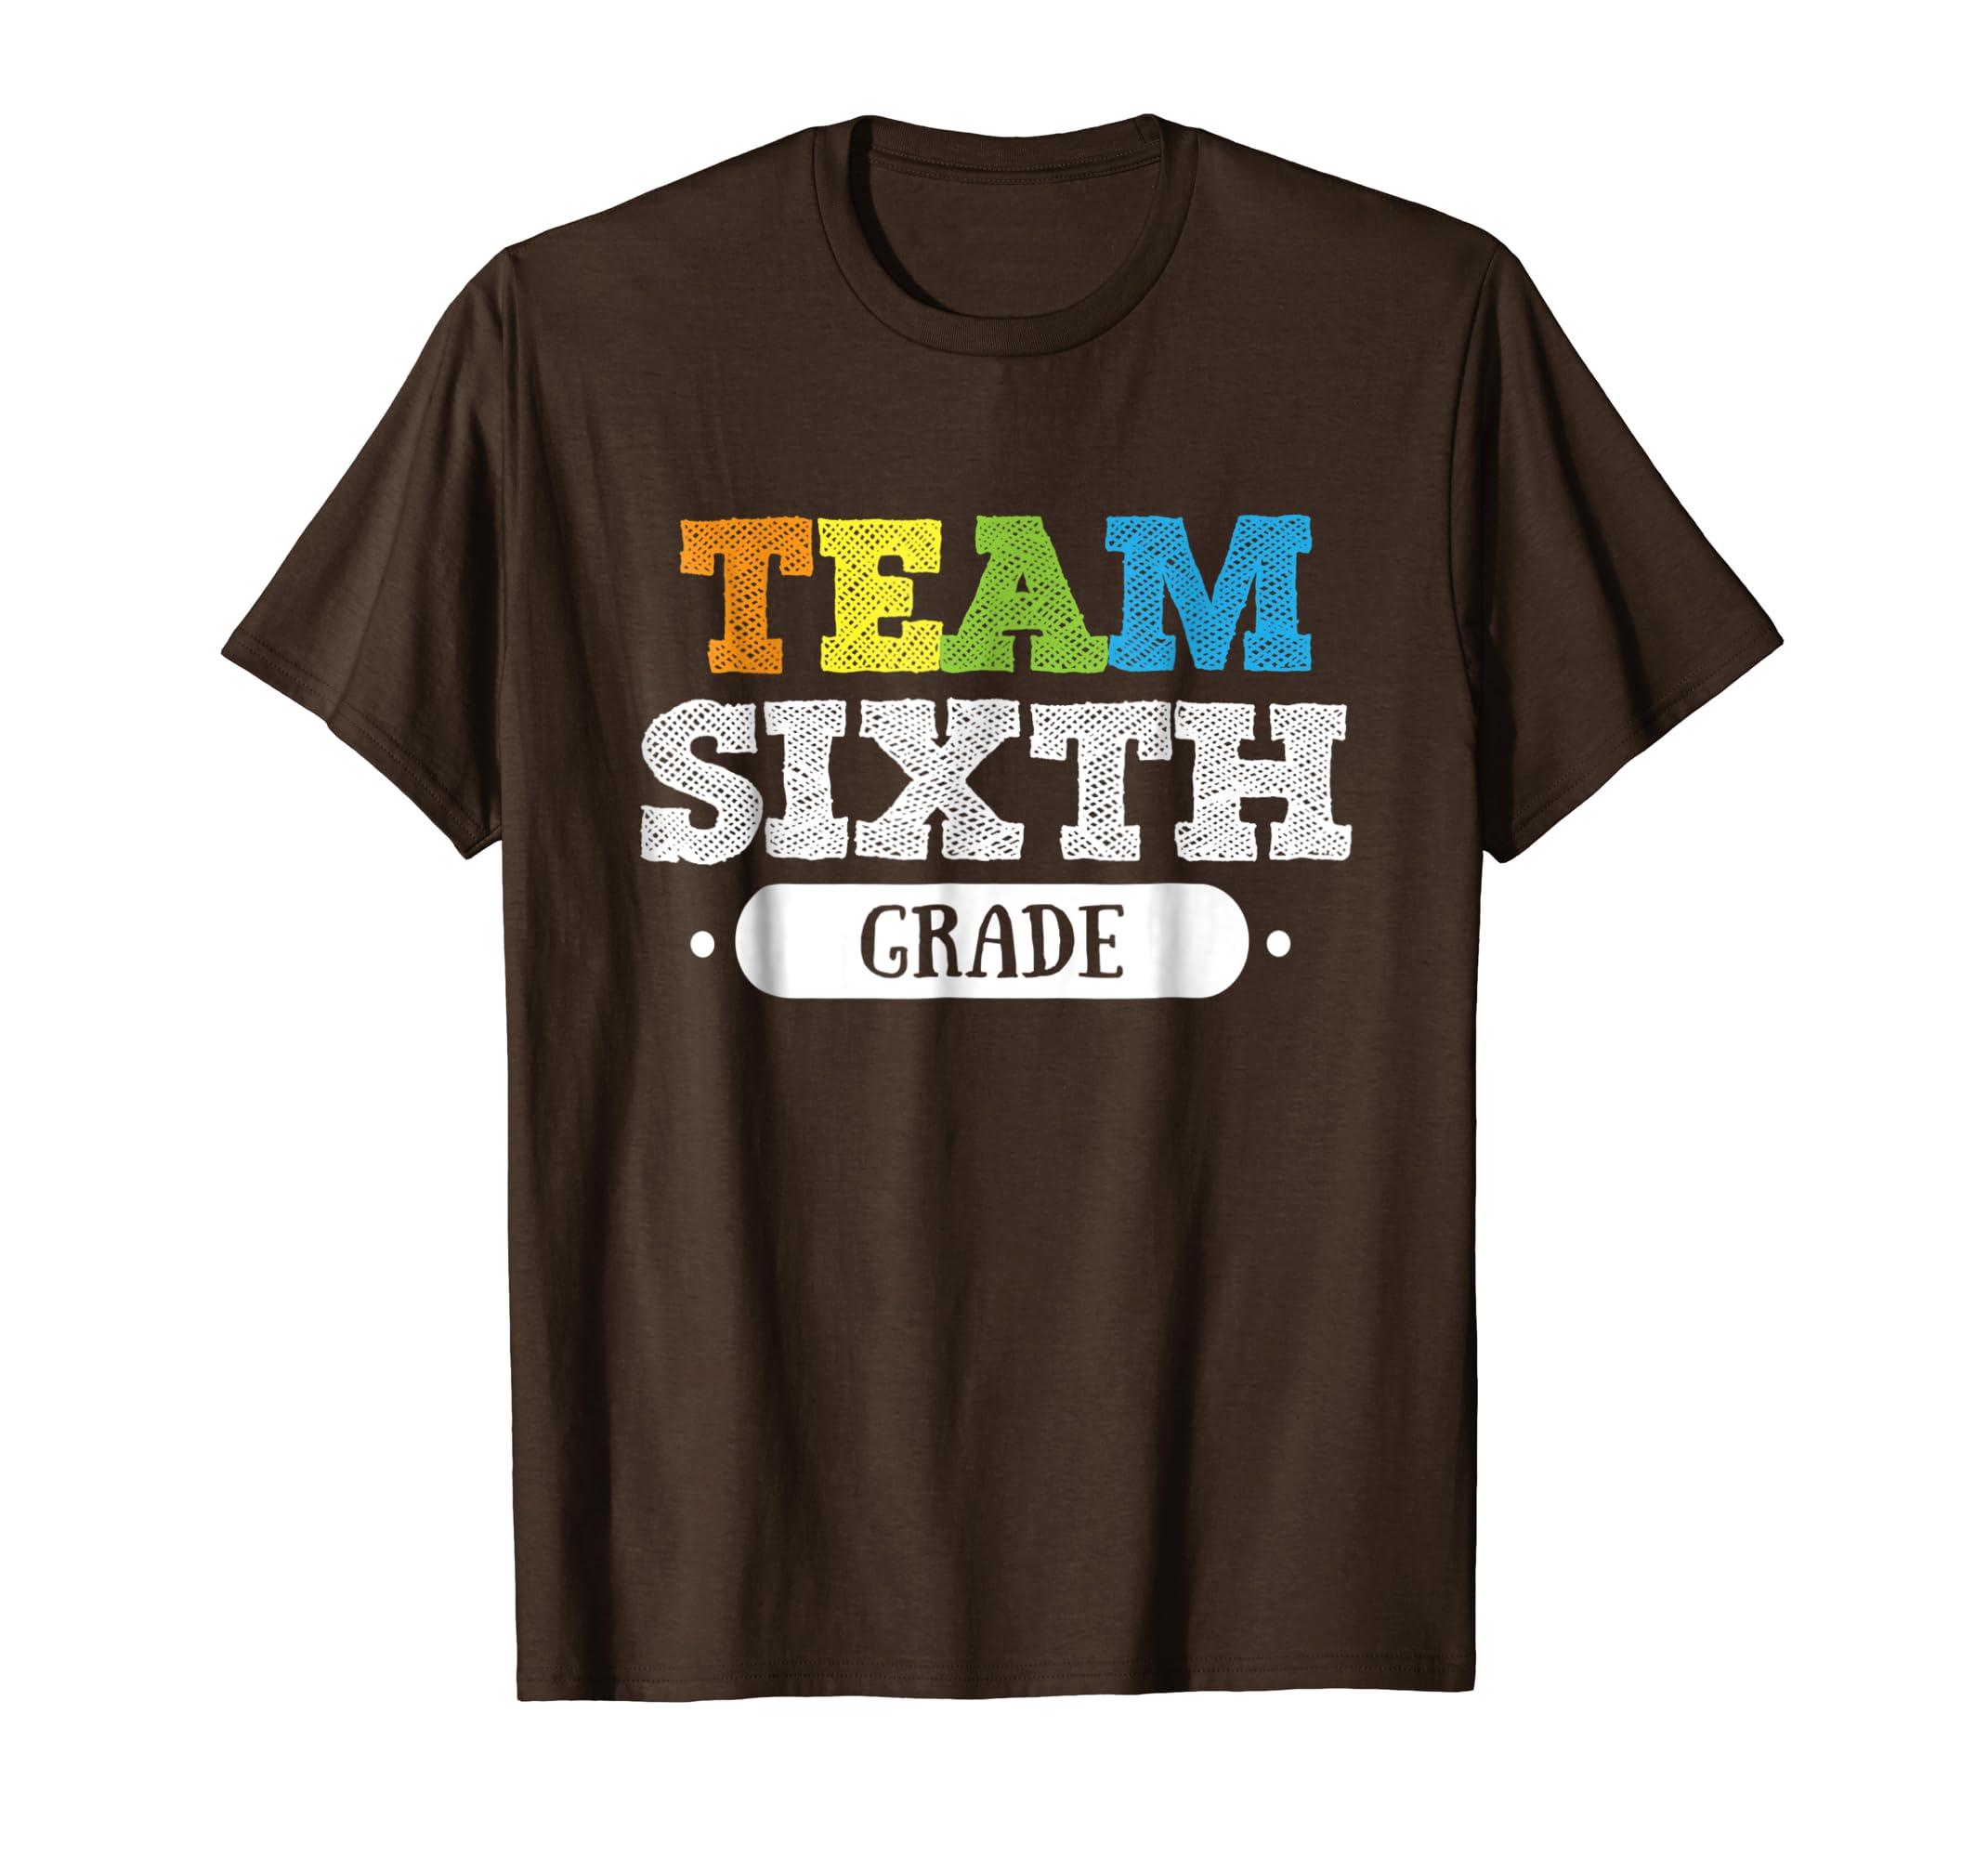 6th Grade Teacher Team 6th Grade T Shirt 1st Day of School